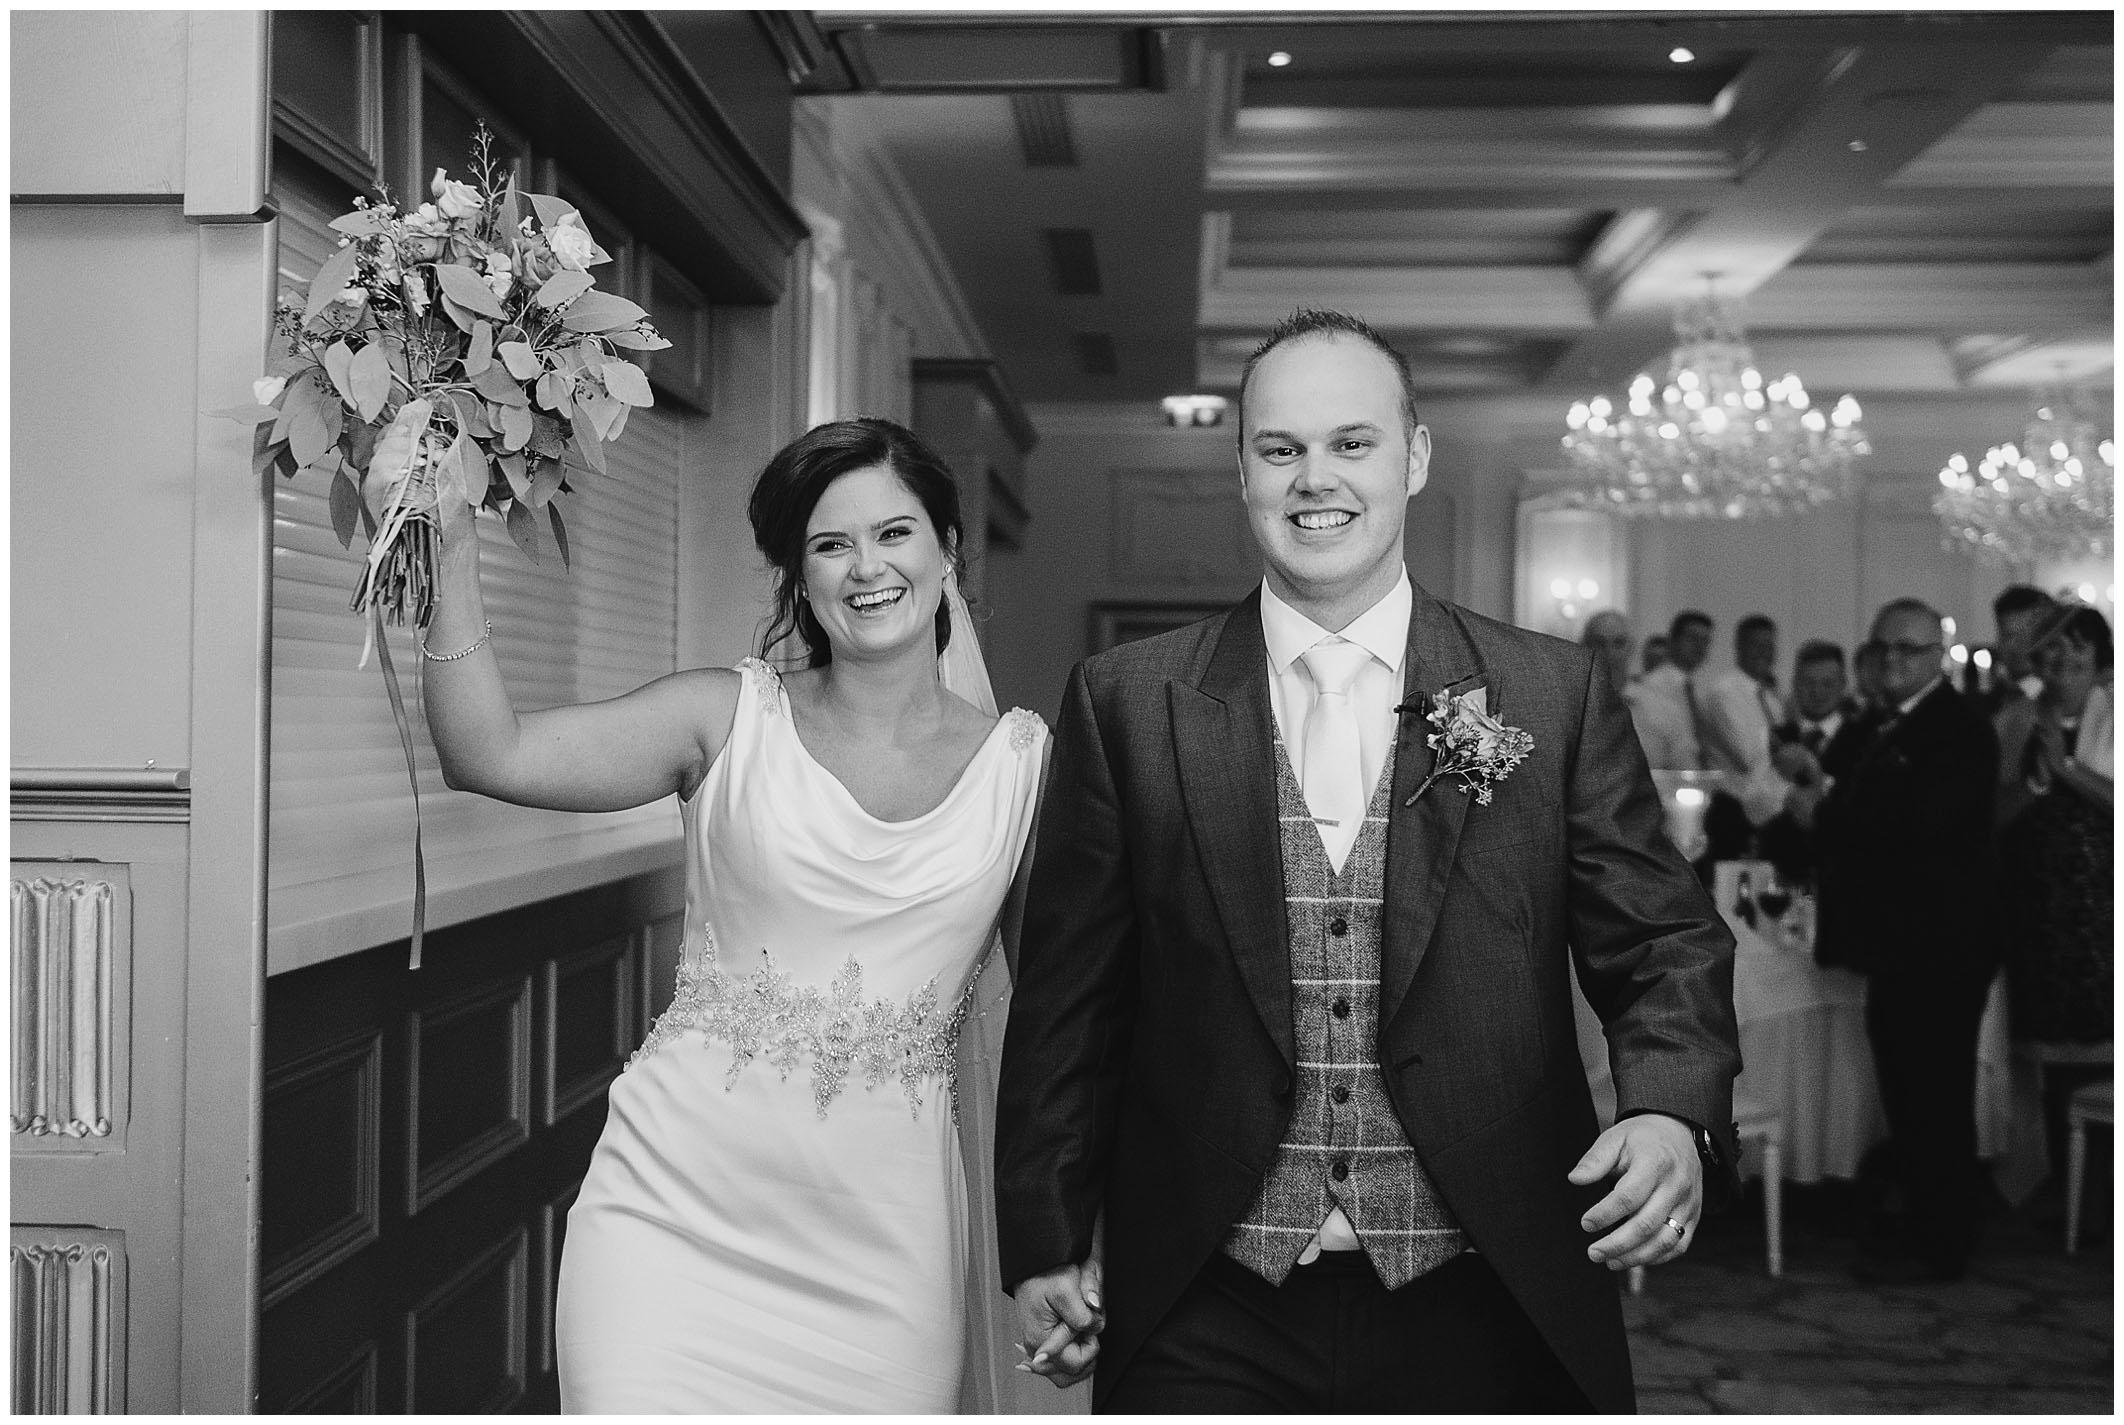 lough-erne-wedding-jude-browne-photography_0197.jpg